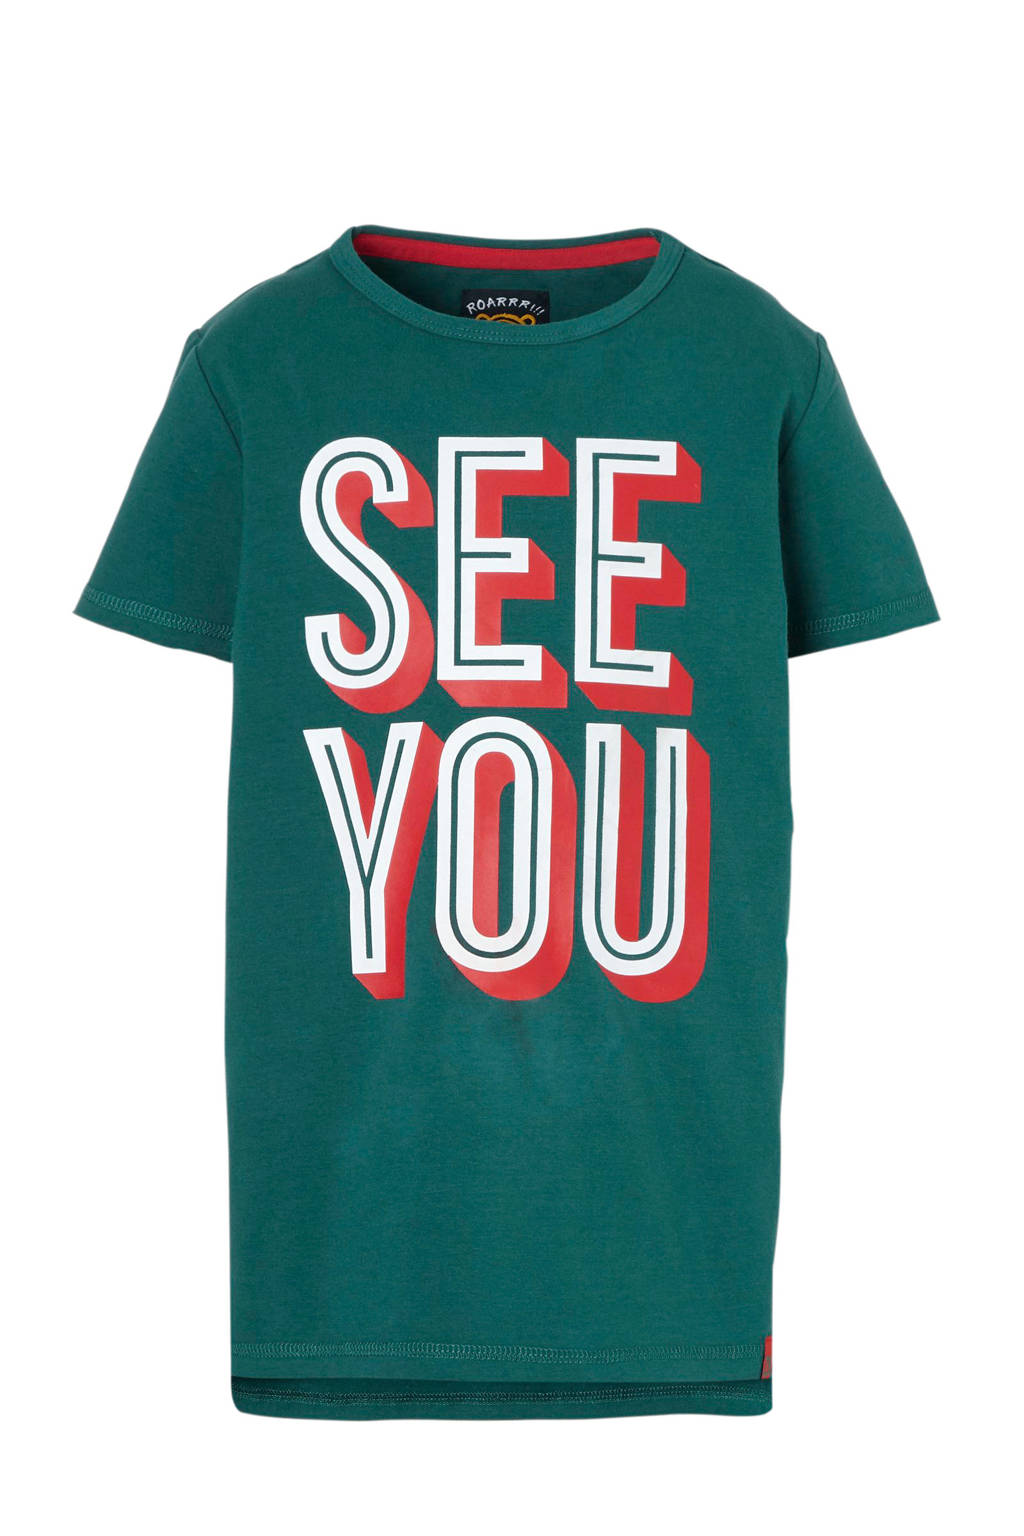 Z8 T-shirt Ruben met tekst groen, Groen/Wit/Rood